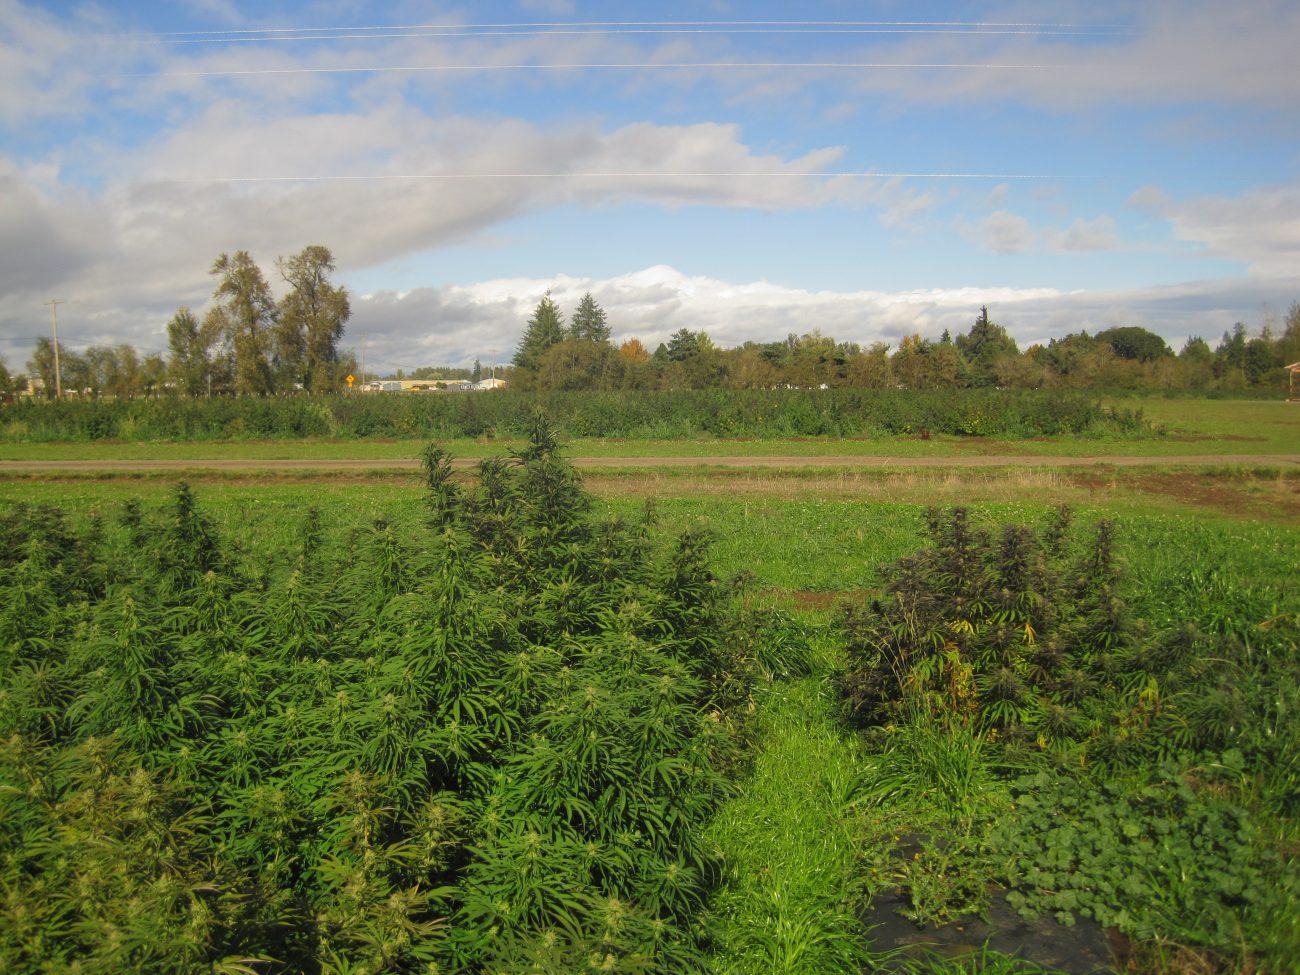 Flower power: Canada's new hemp rules boost CBD production, but